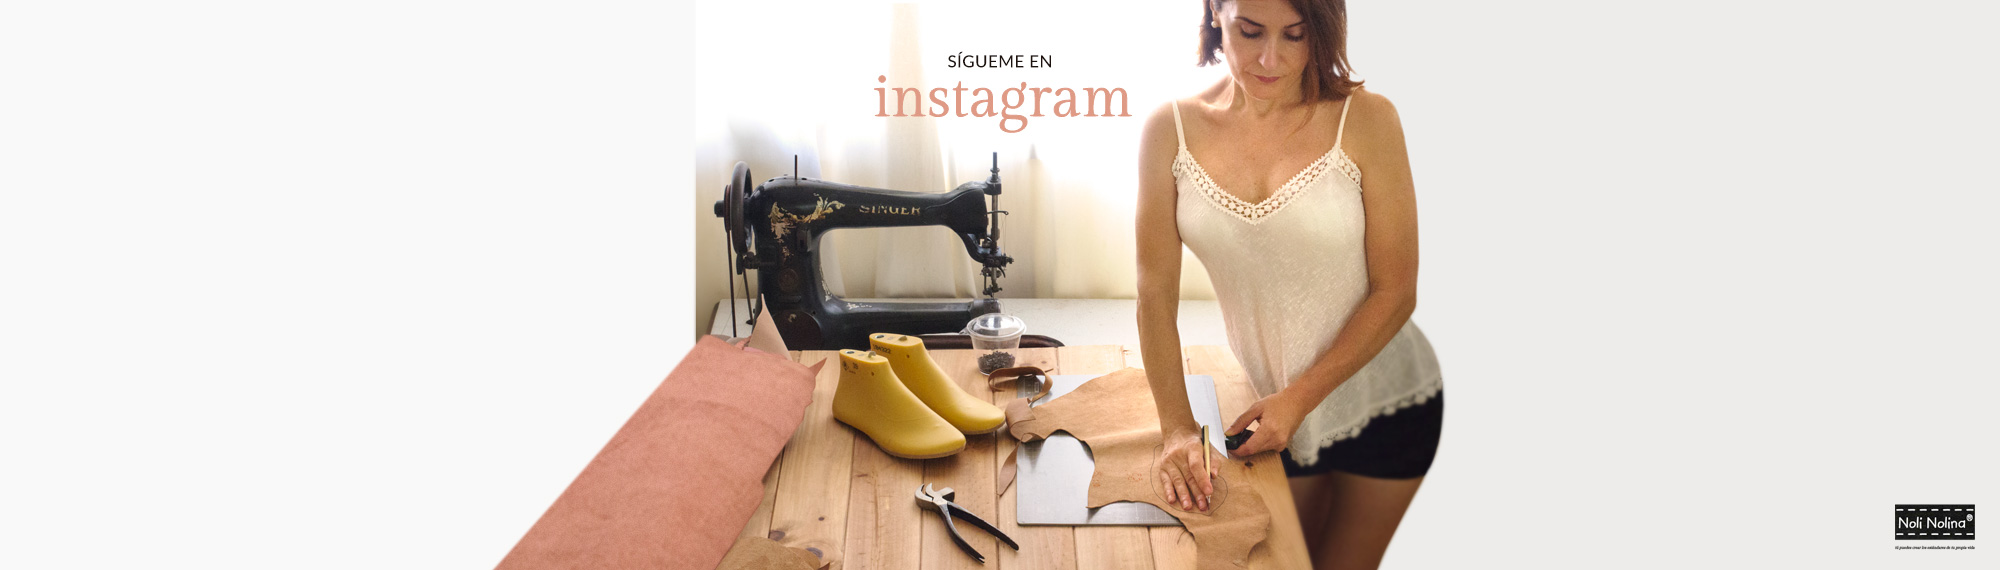 Instagram Cabecera